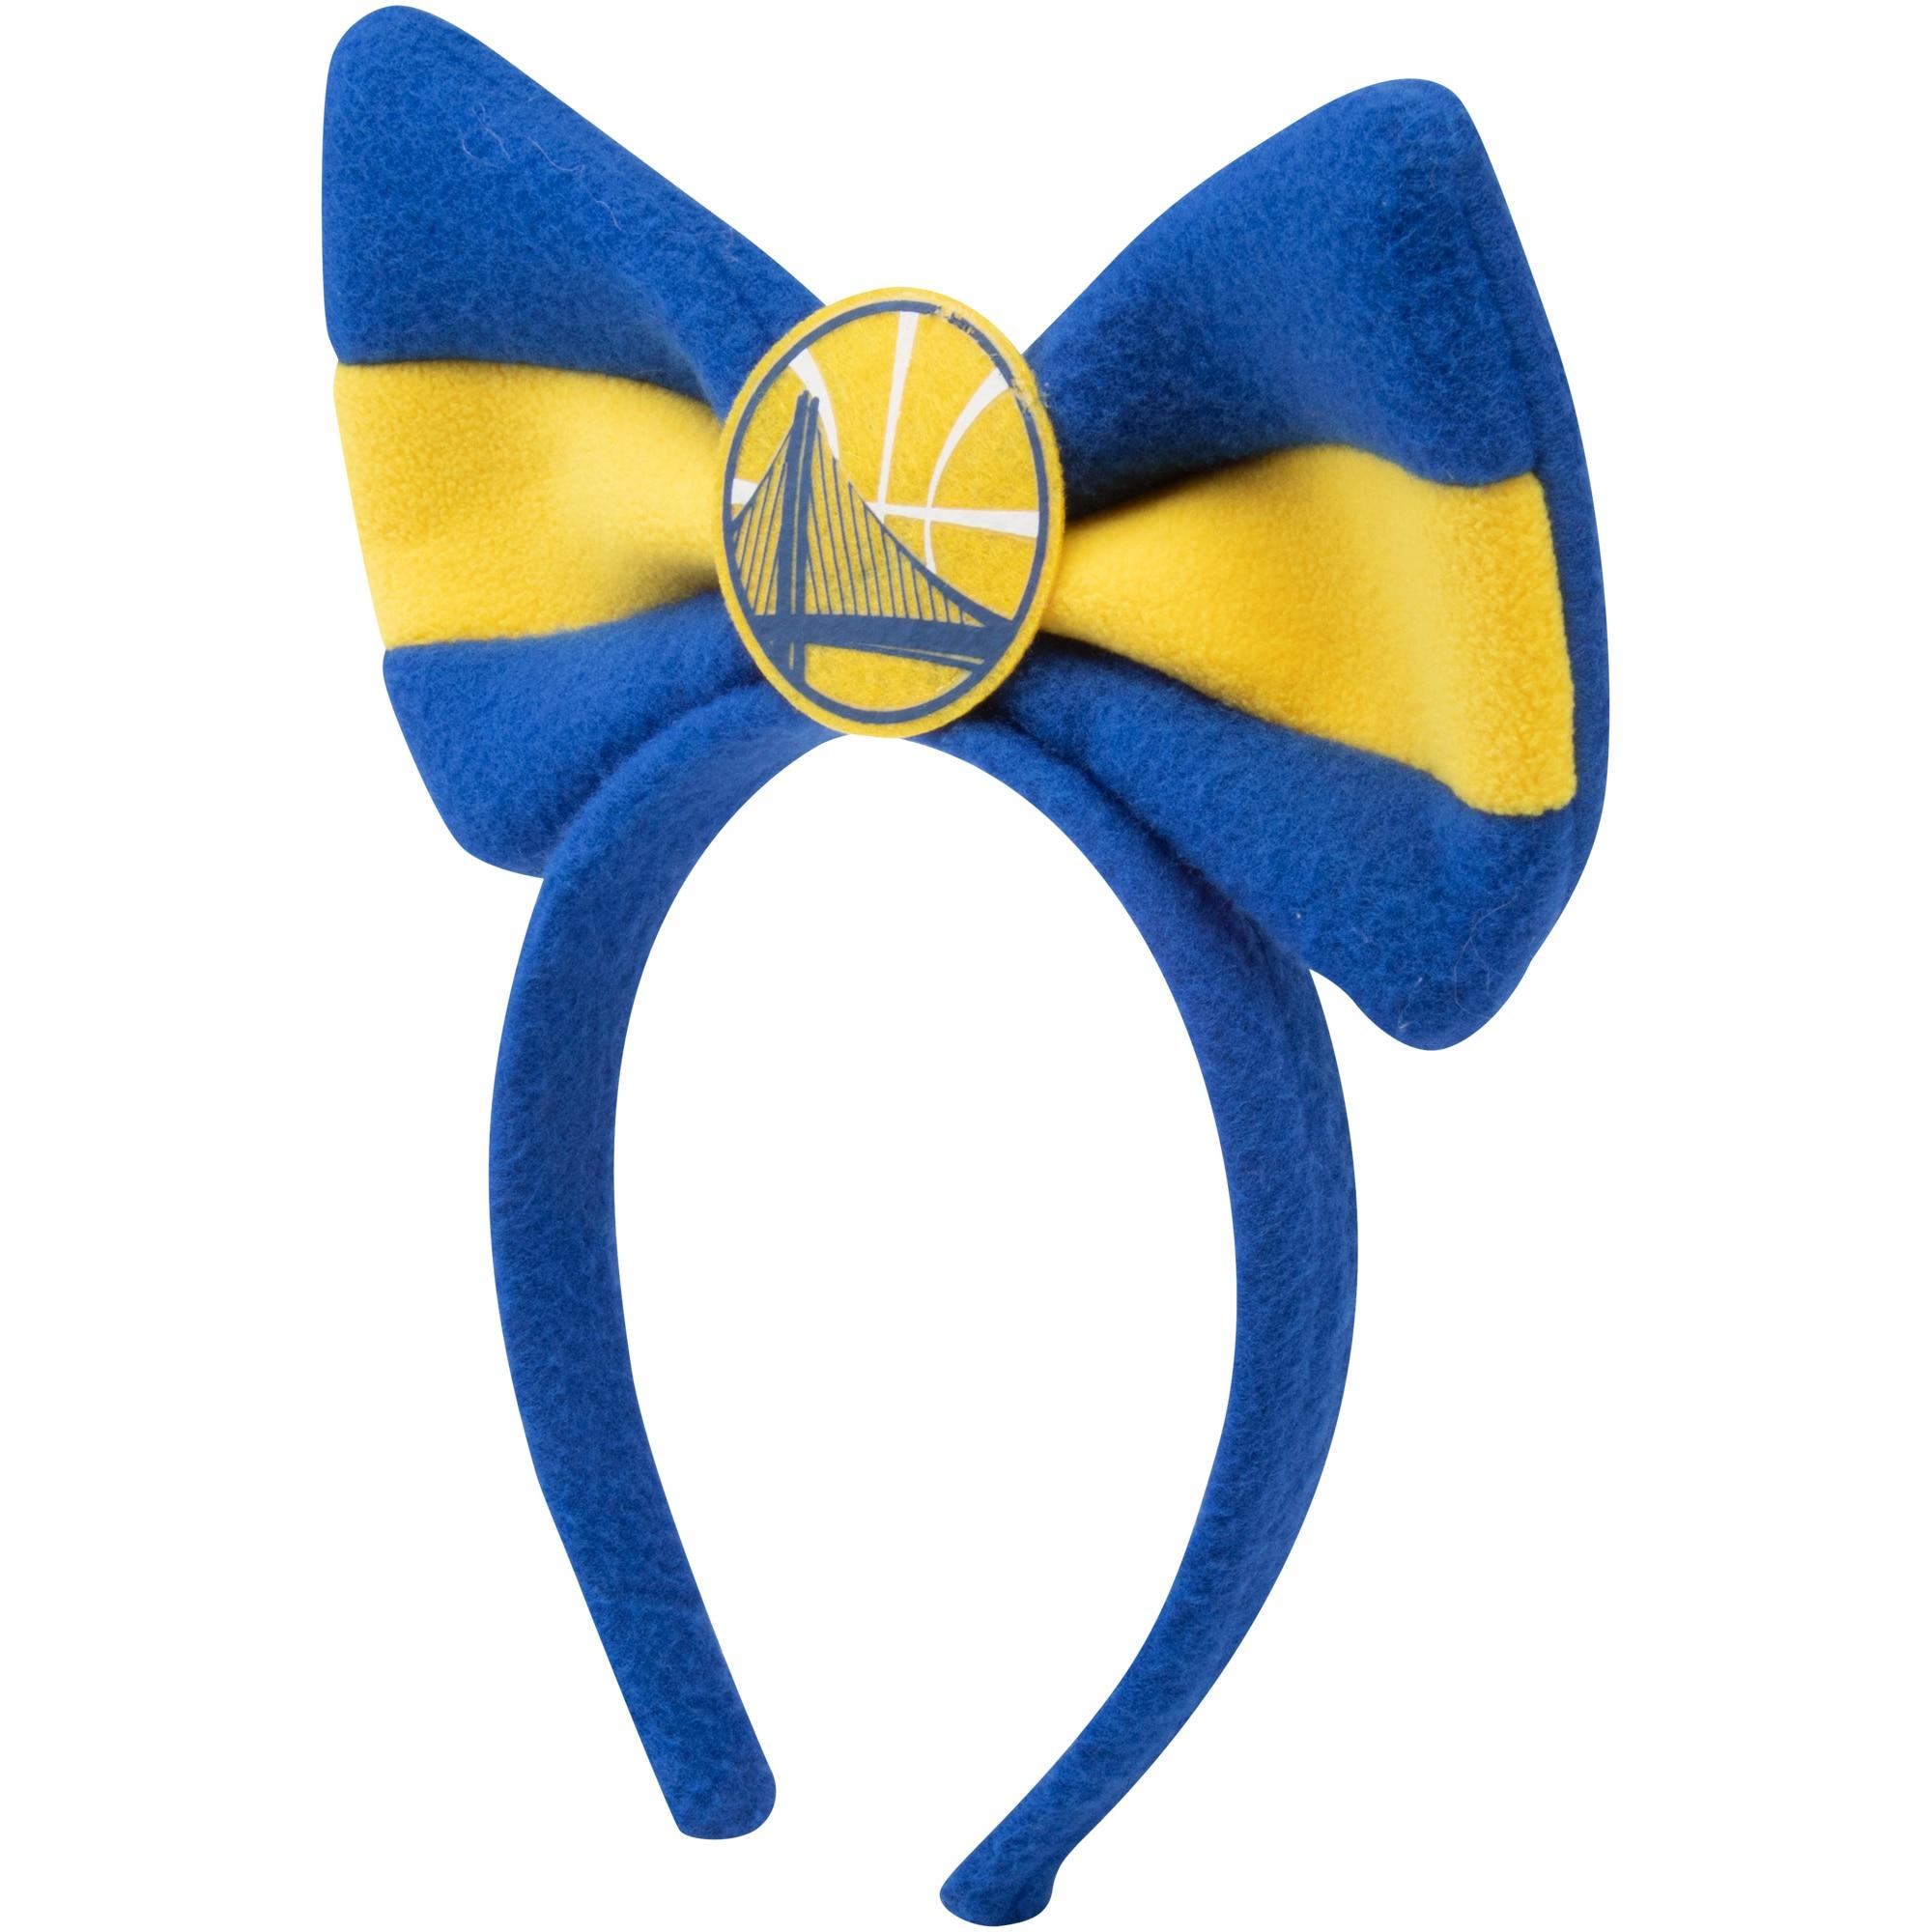 Golden State Warriors Ribbon Headband